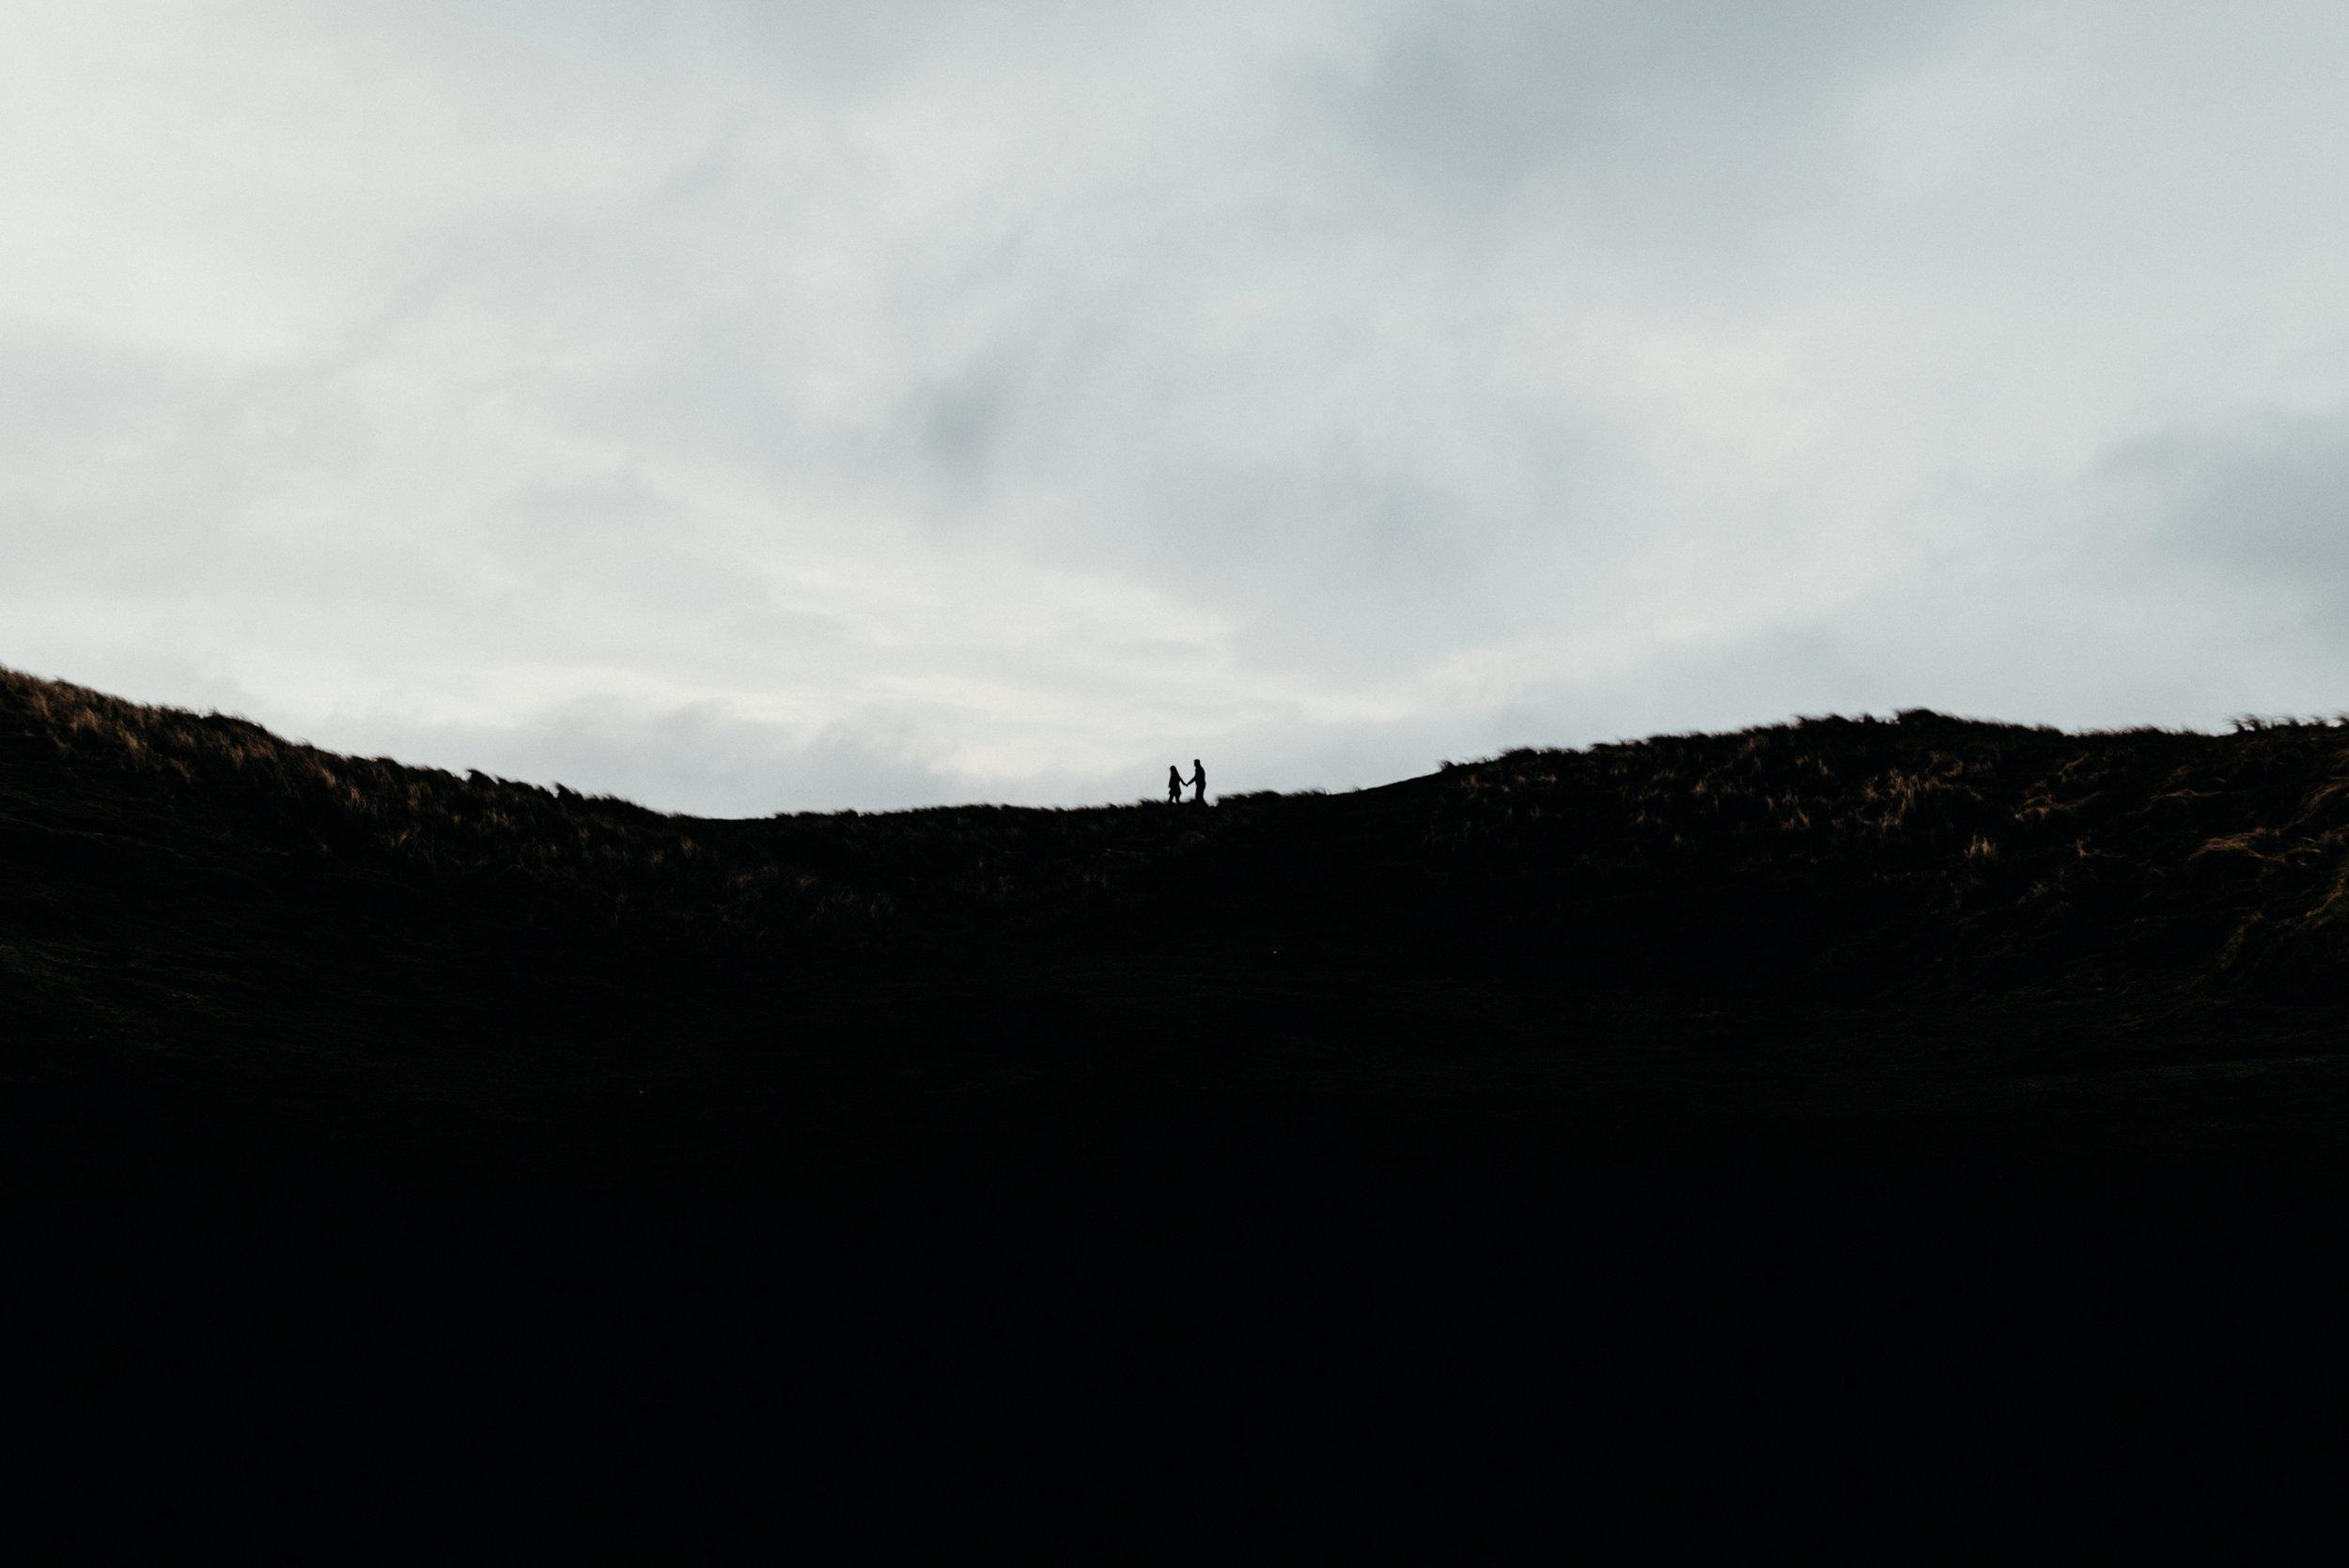 Cliffs Of Moher Engagement Session - Cliffs of Moher Proposal - Cliffs of Mhoer Elopement_6399-Edit-3.jpg